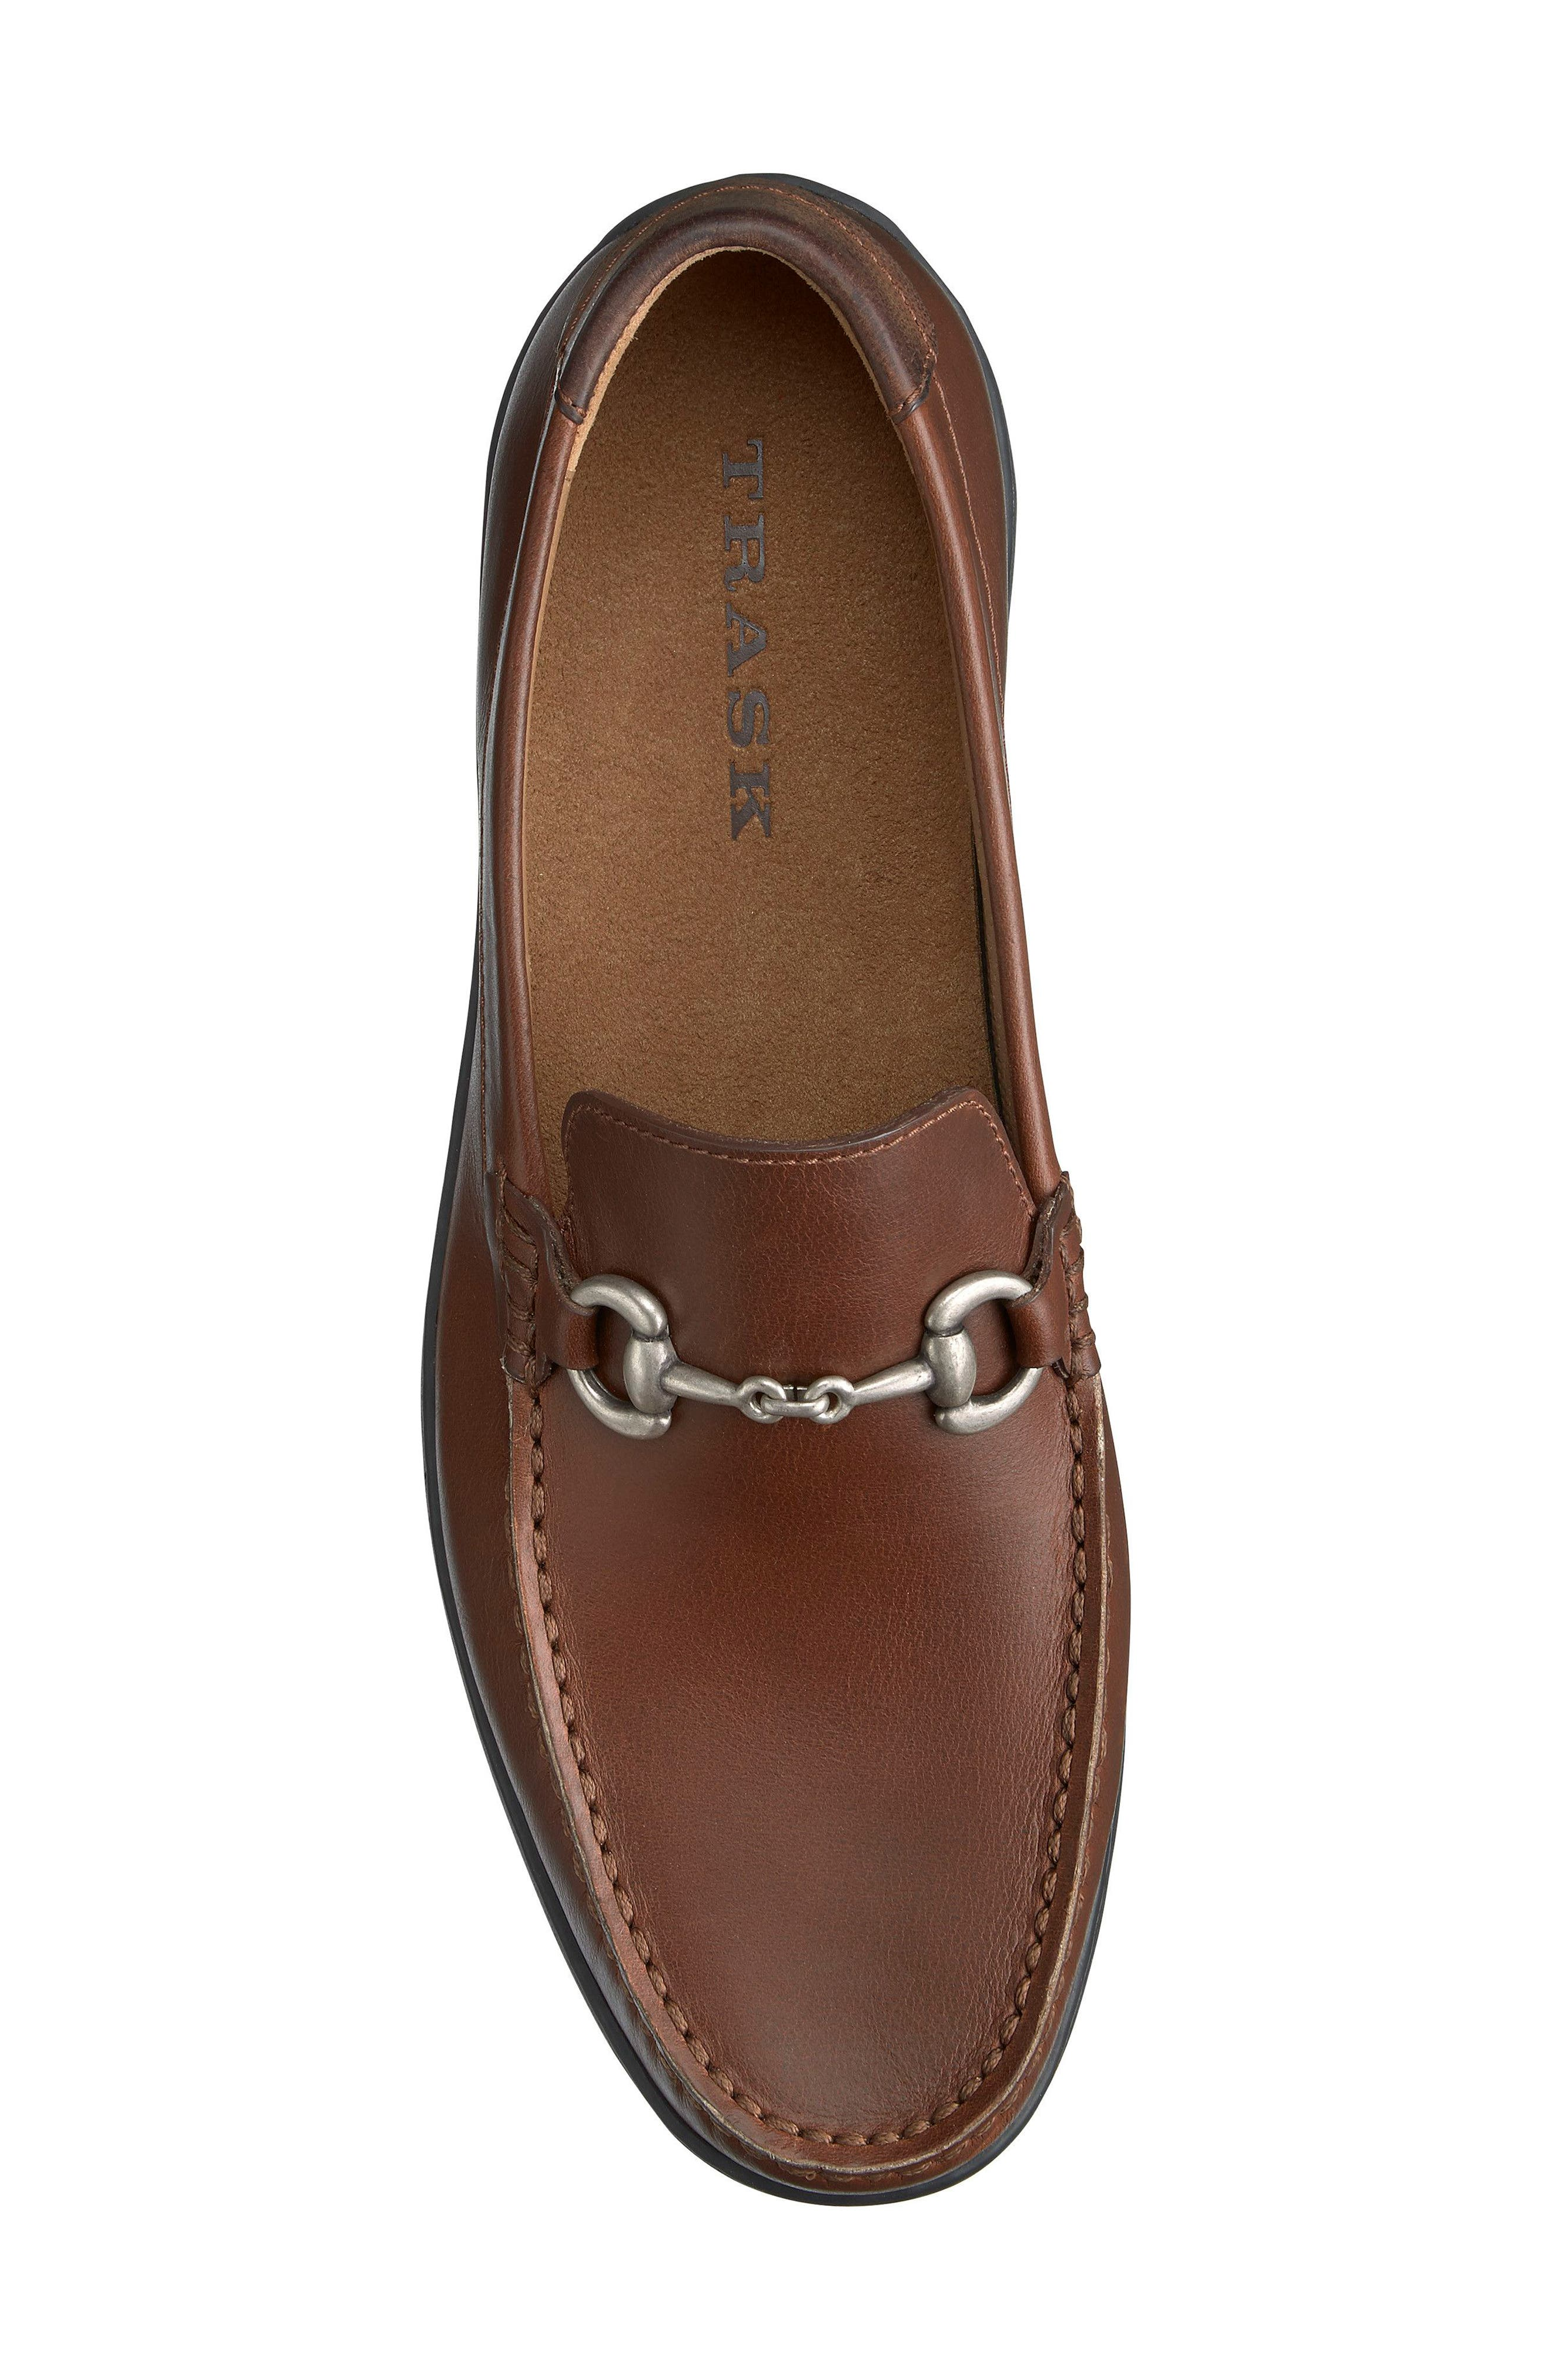 Stalworth Bit Loafer,                             Alternate thumbnail 5, color,                             Brandy Leather